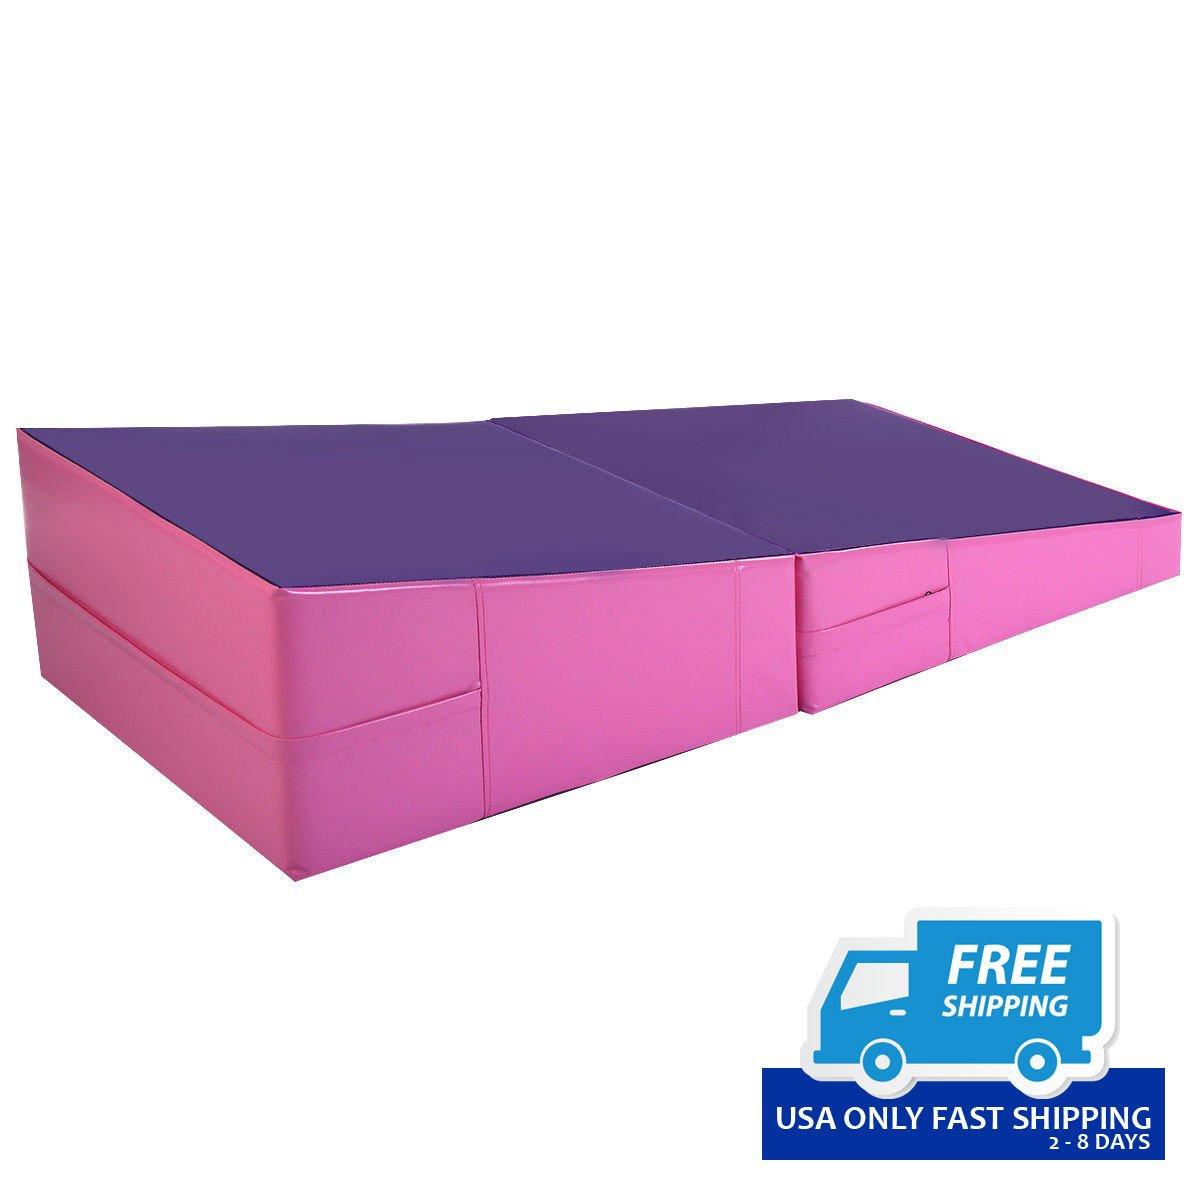 choice products purple best cheese tumbling skill mats folding x shape gymnastics wedge mat pink incline